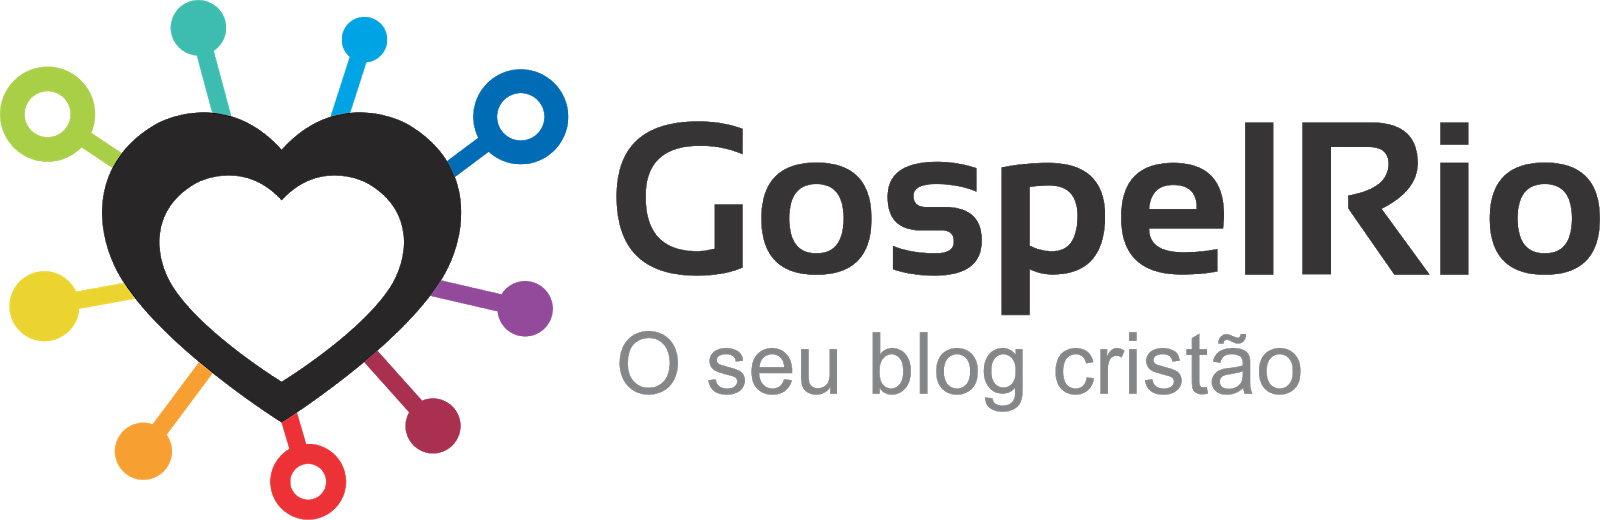 Gospel Rio